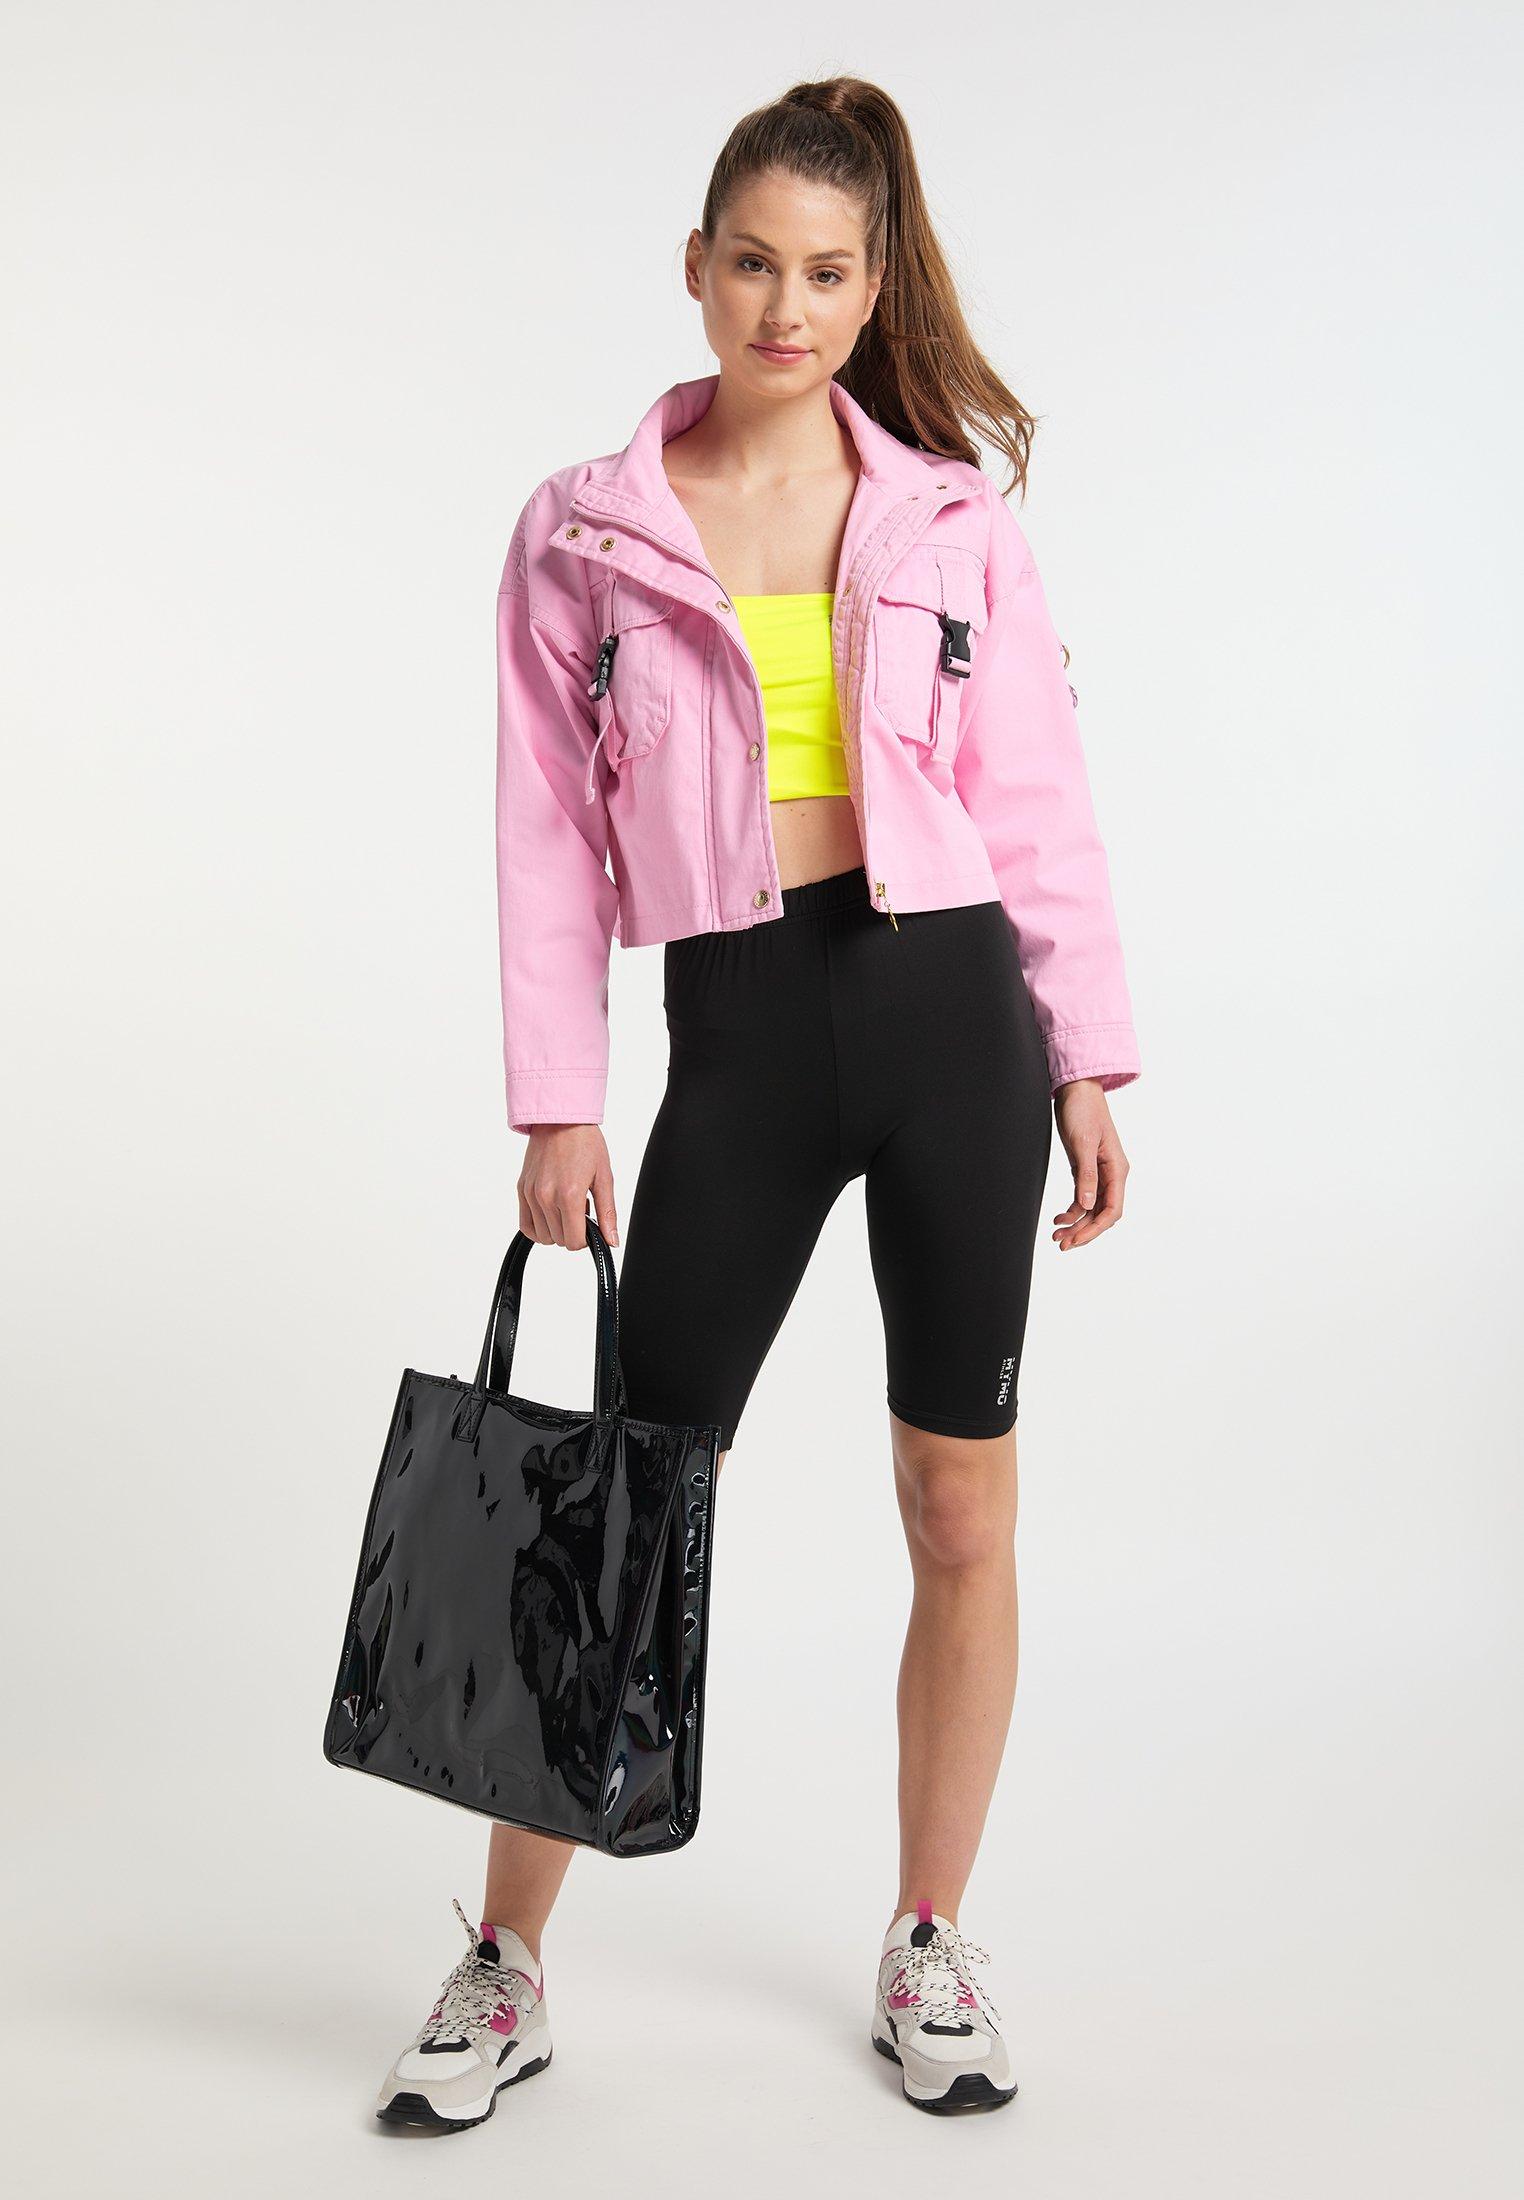 myMo ATHLSR Shopping bag - schwarz